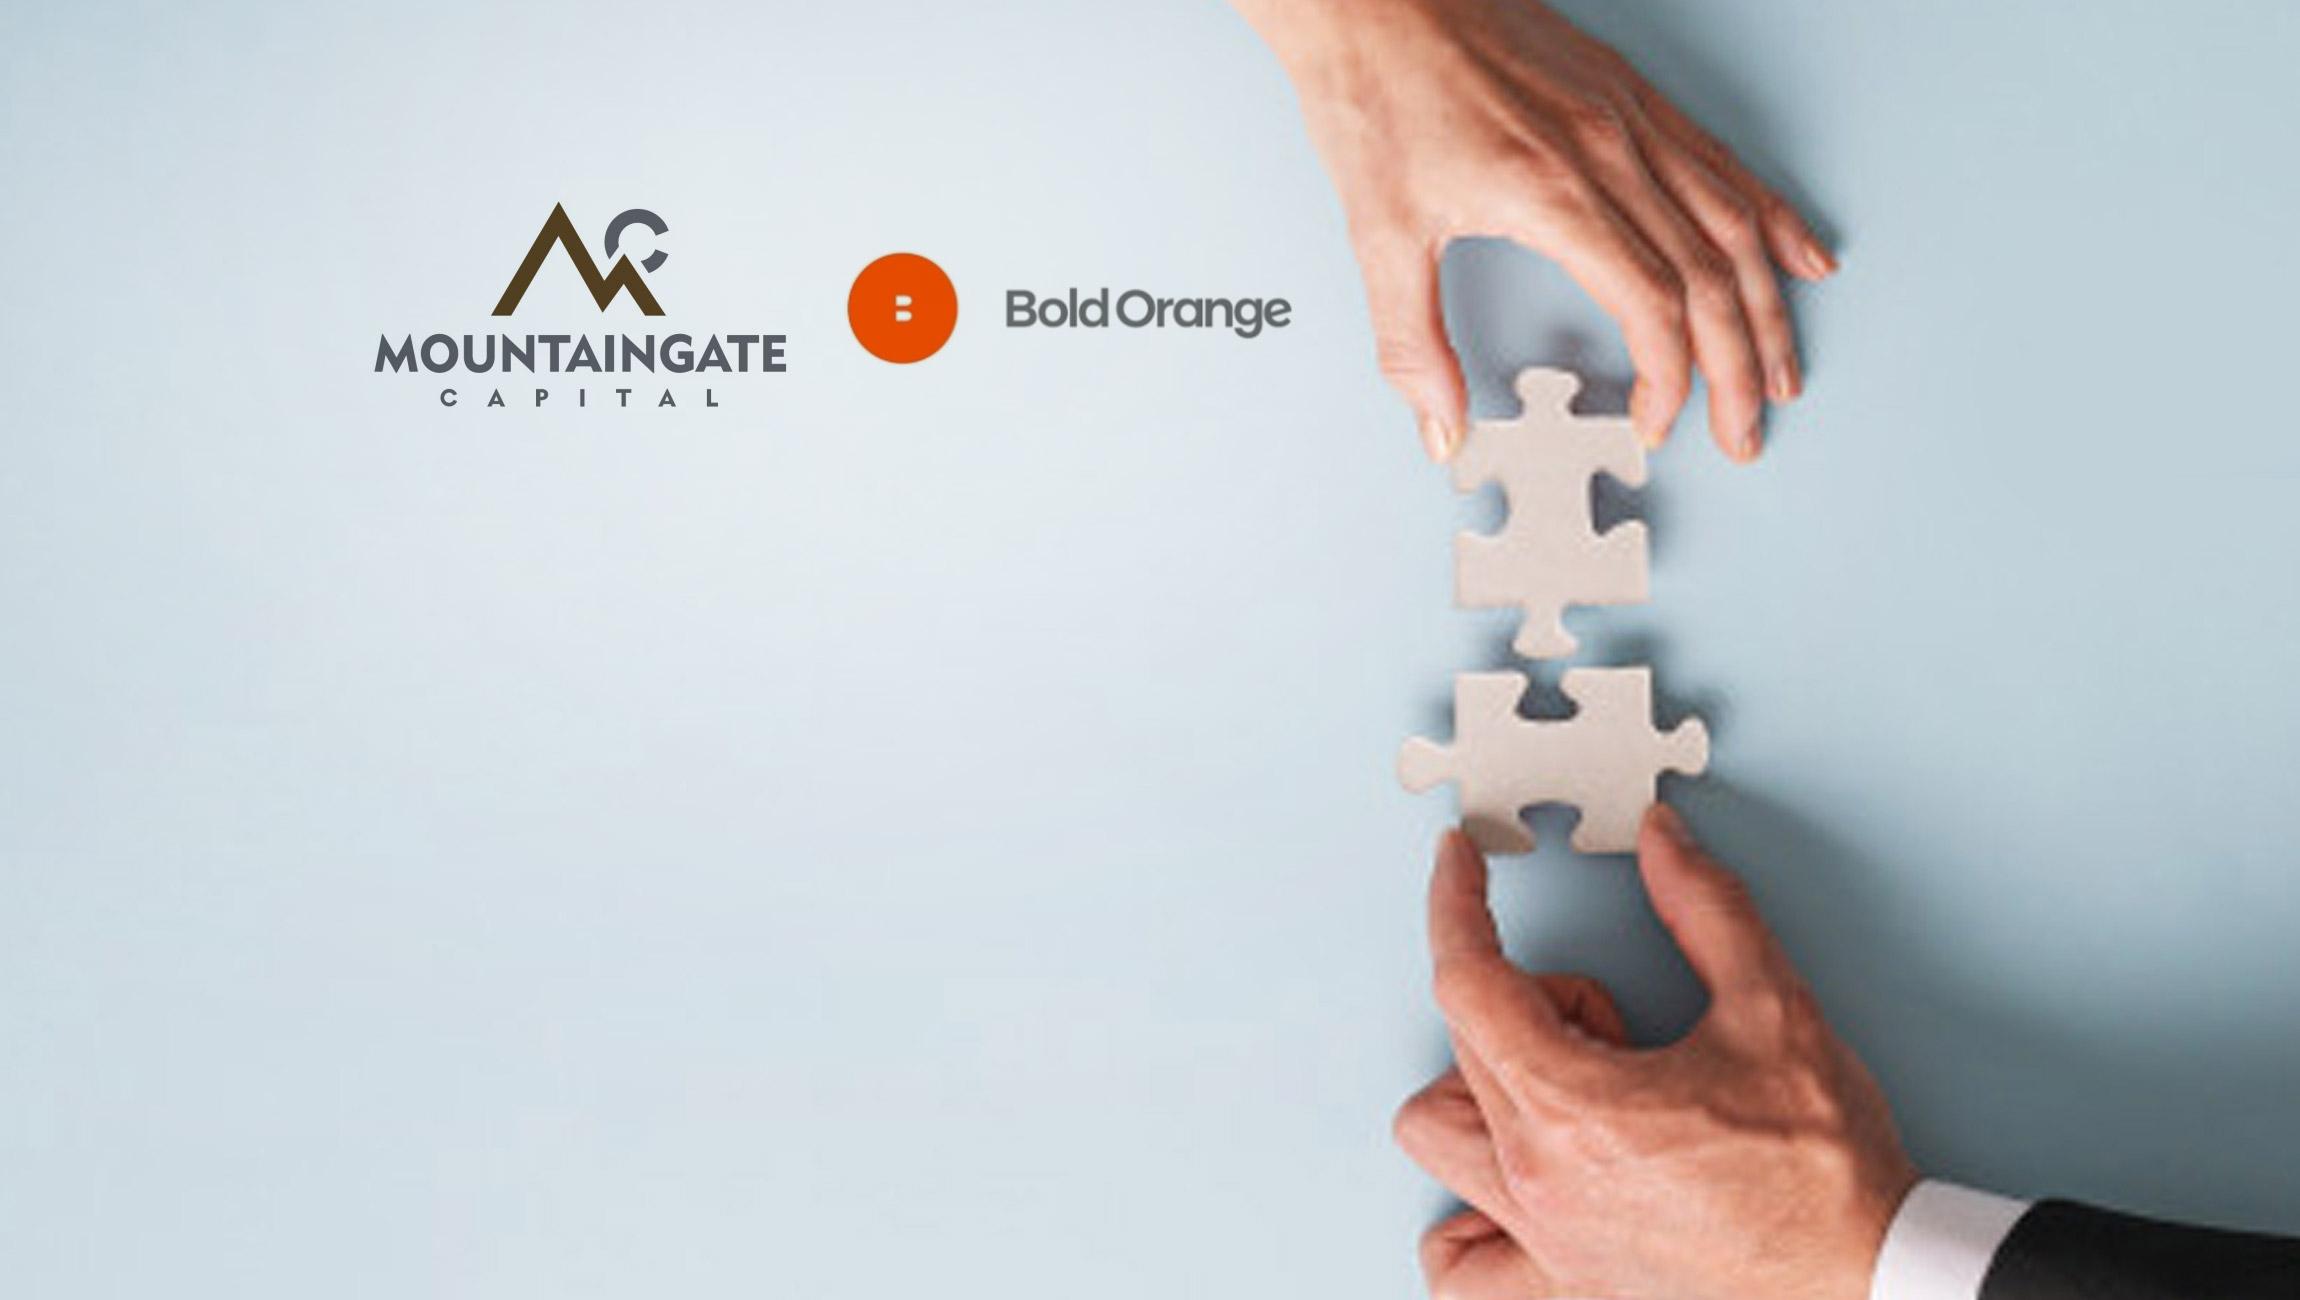 Mountaingate Capital Platform Bold Orange Acquires Customer Experience Agency Three Deep Marketing